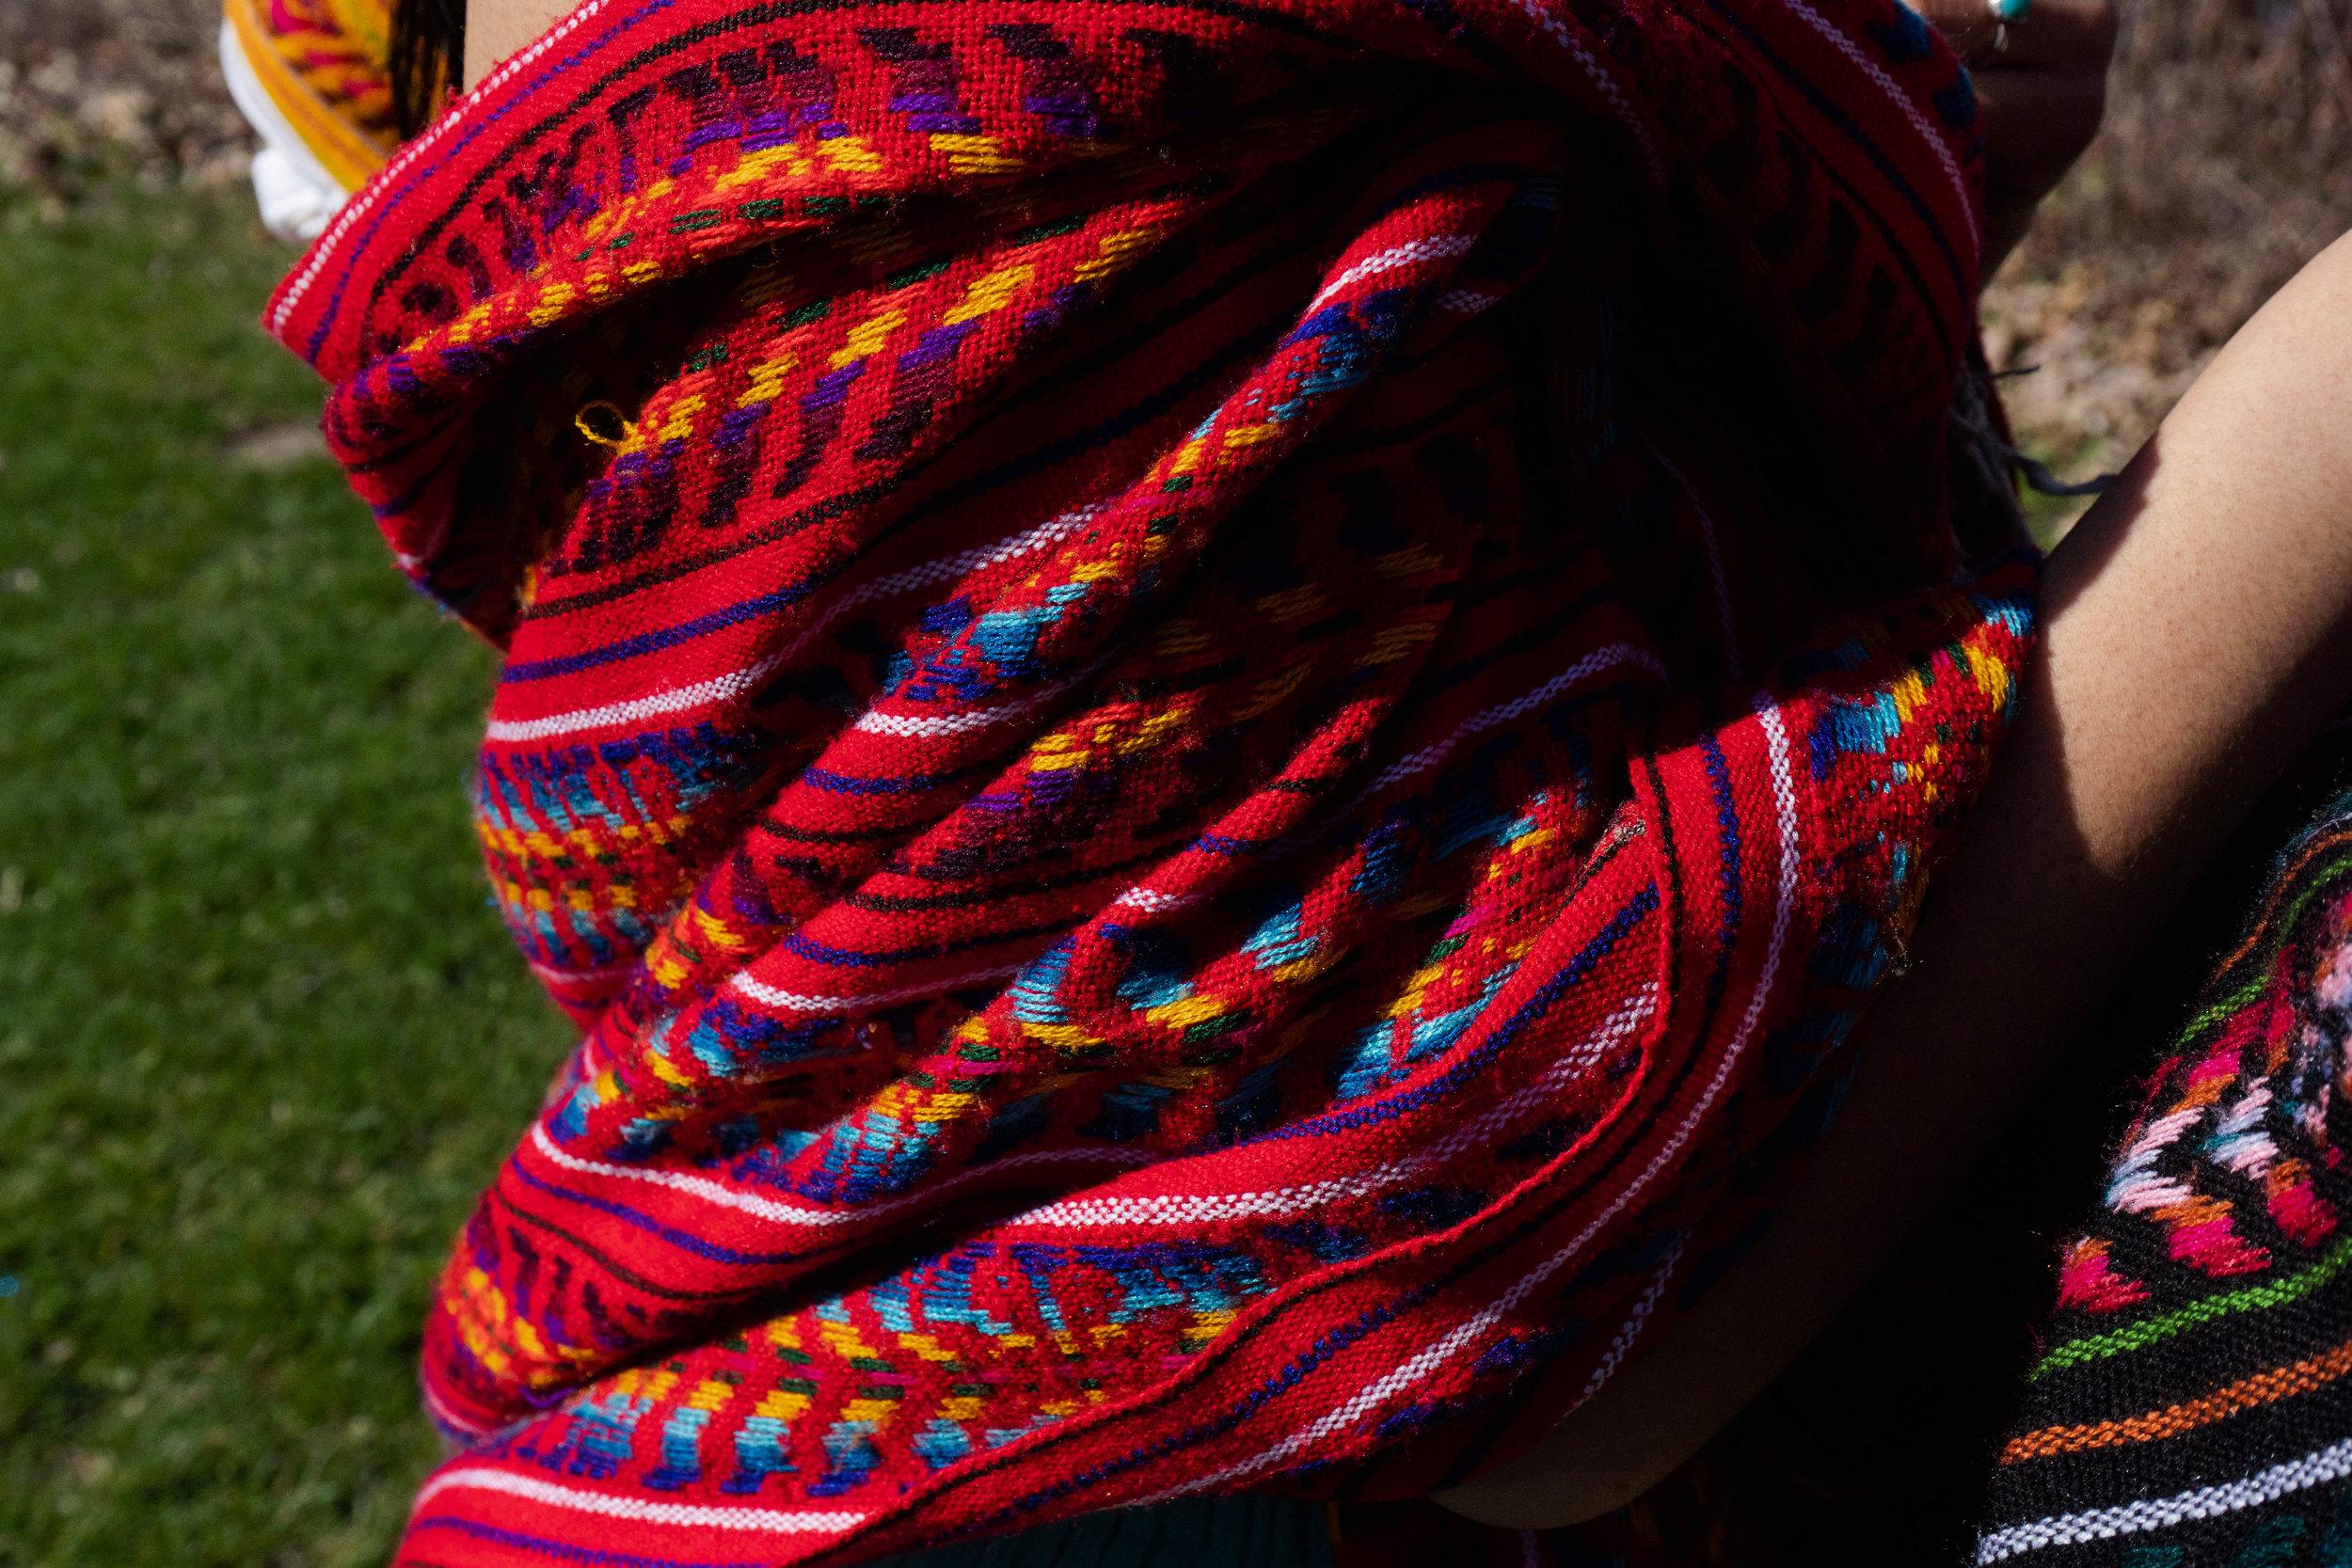 Traditional rebozo shawl worn by Reyna Day.